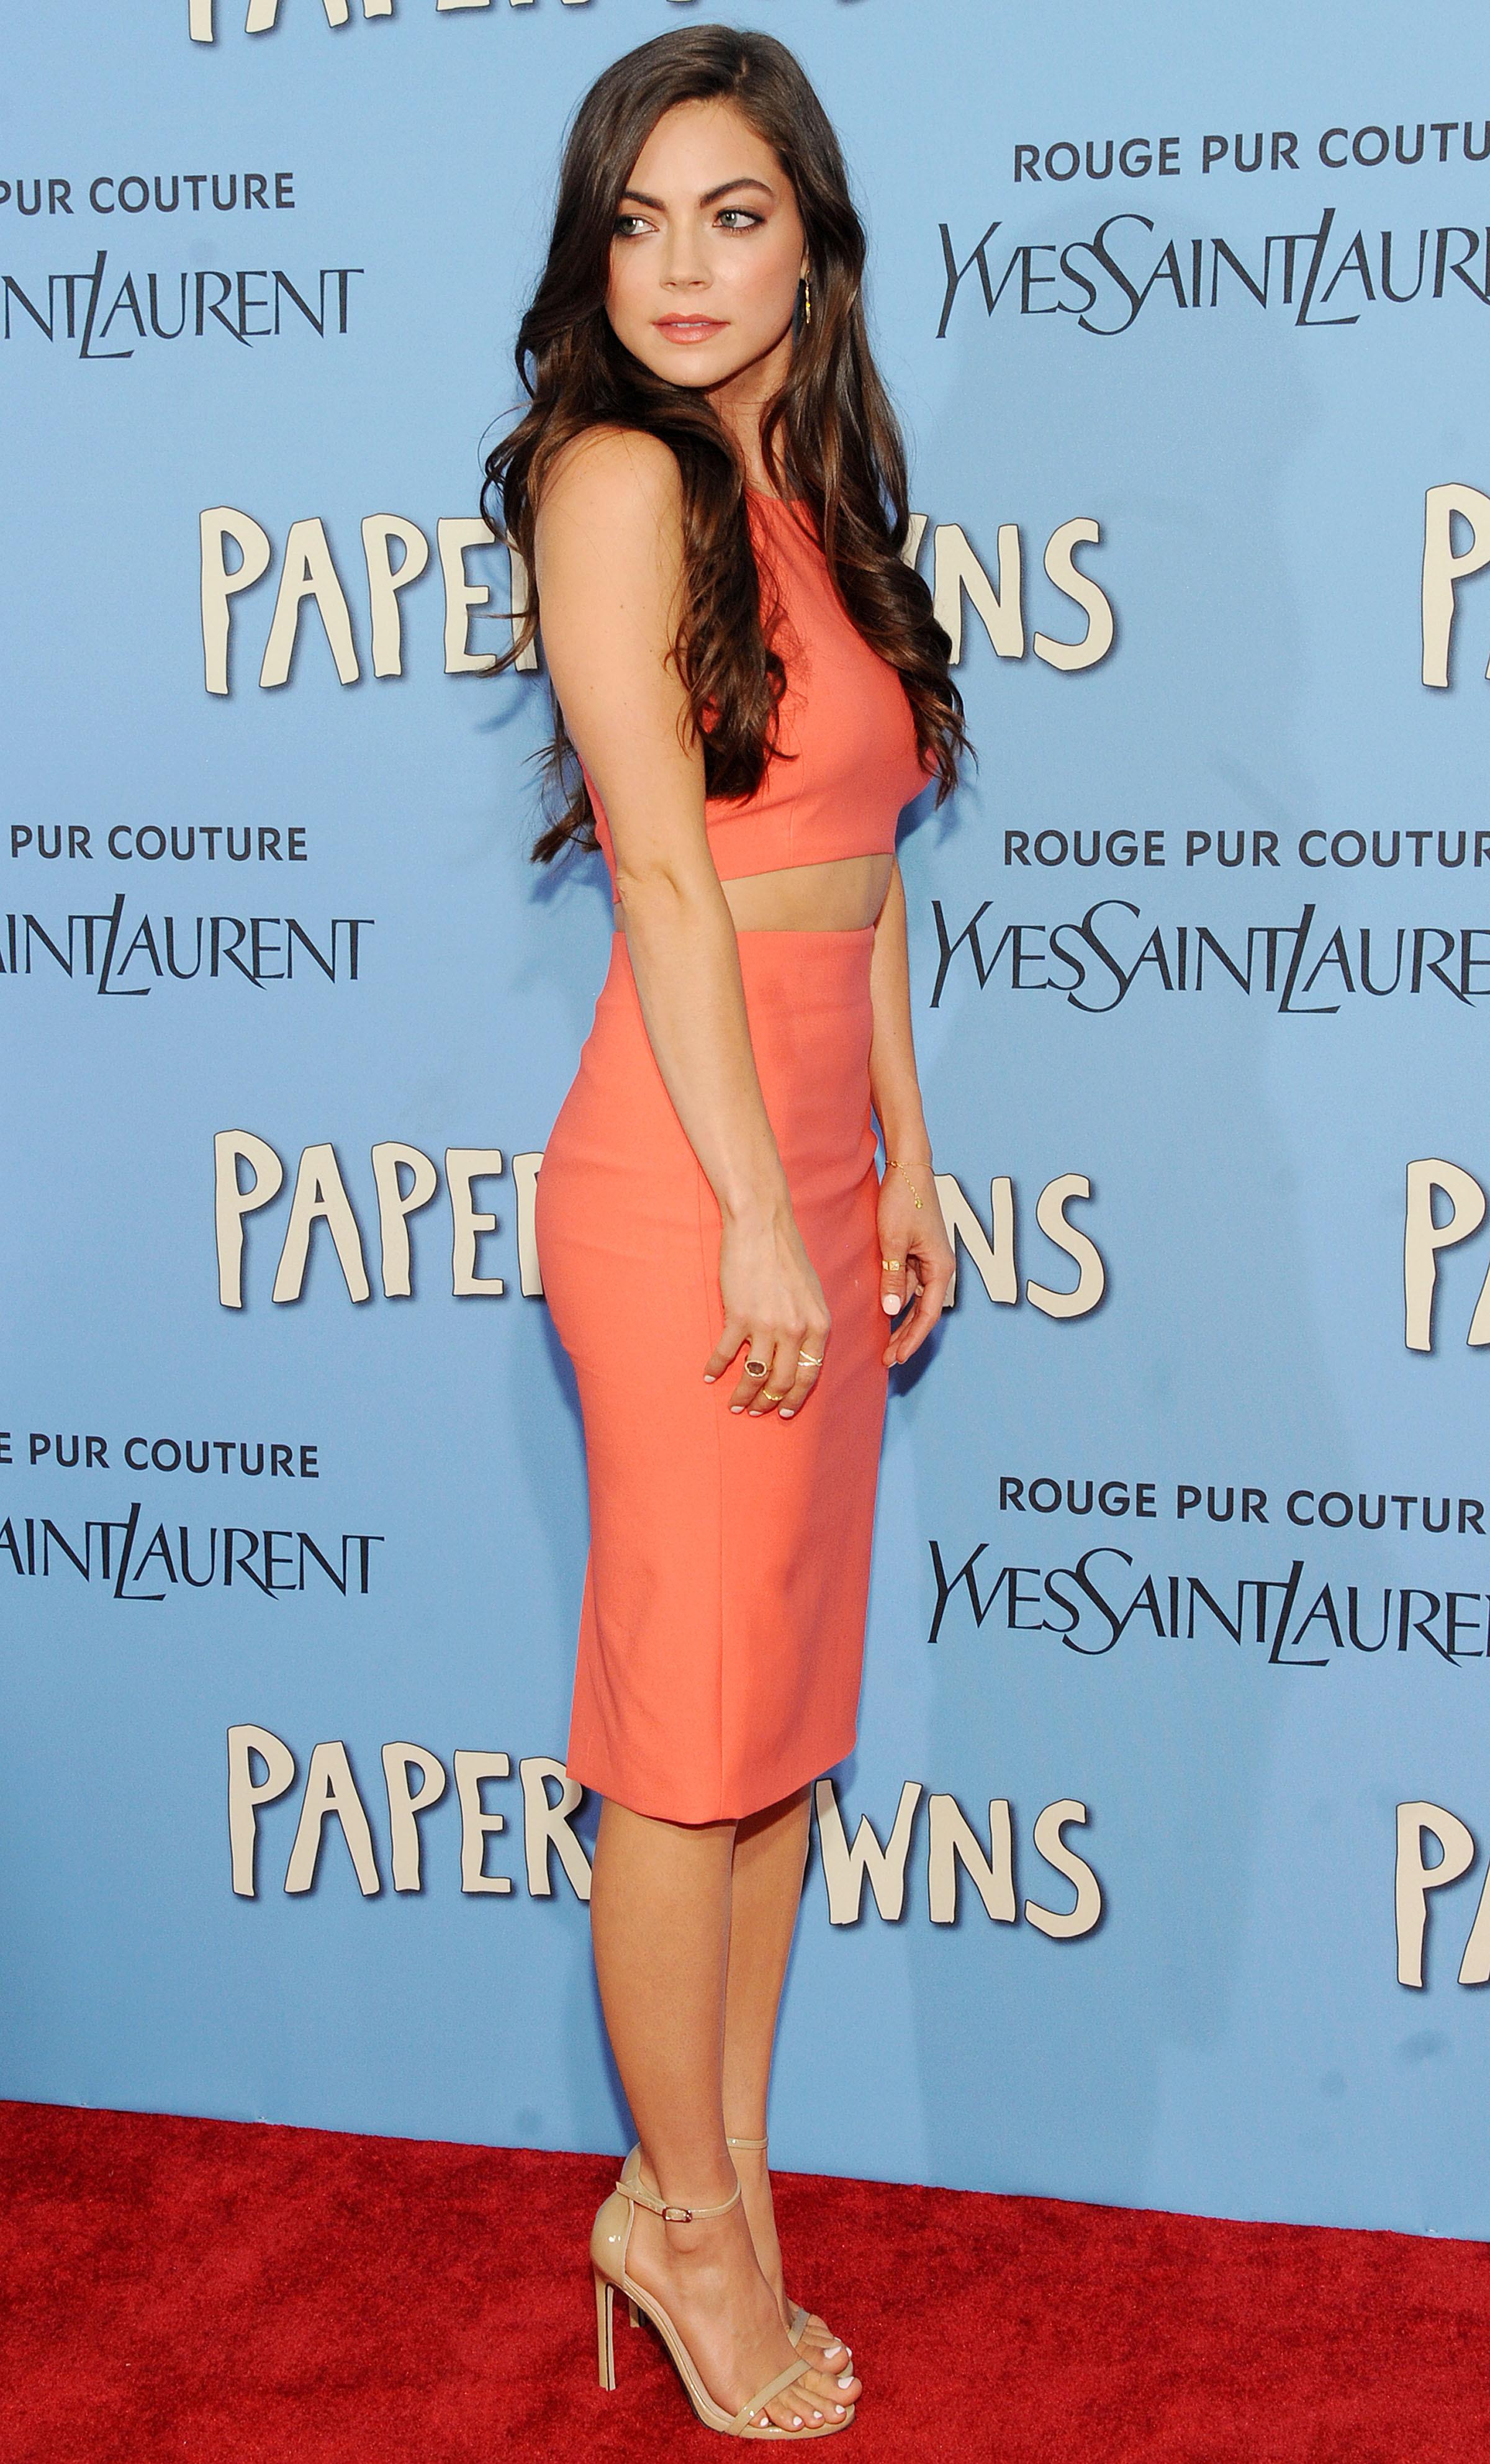 Caitlin Carver en robe moulante